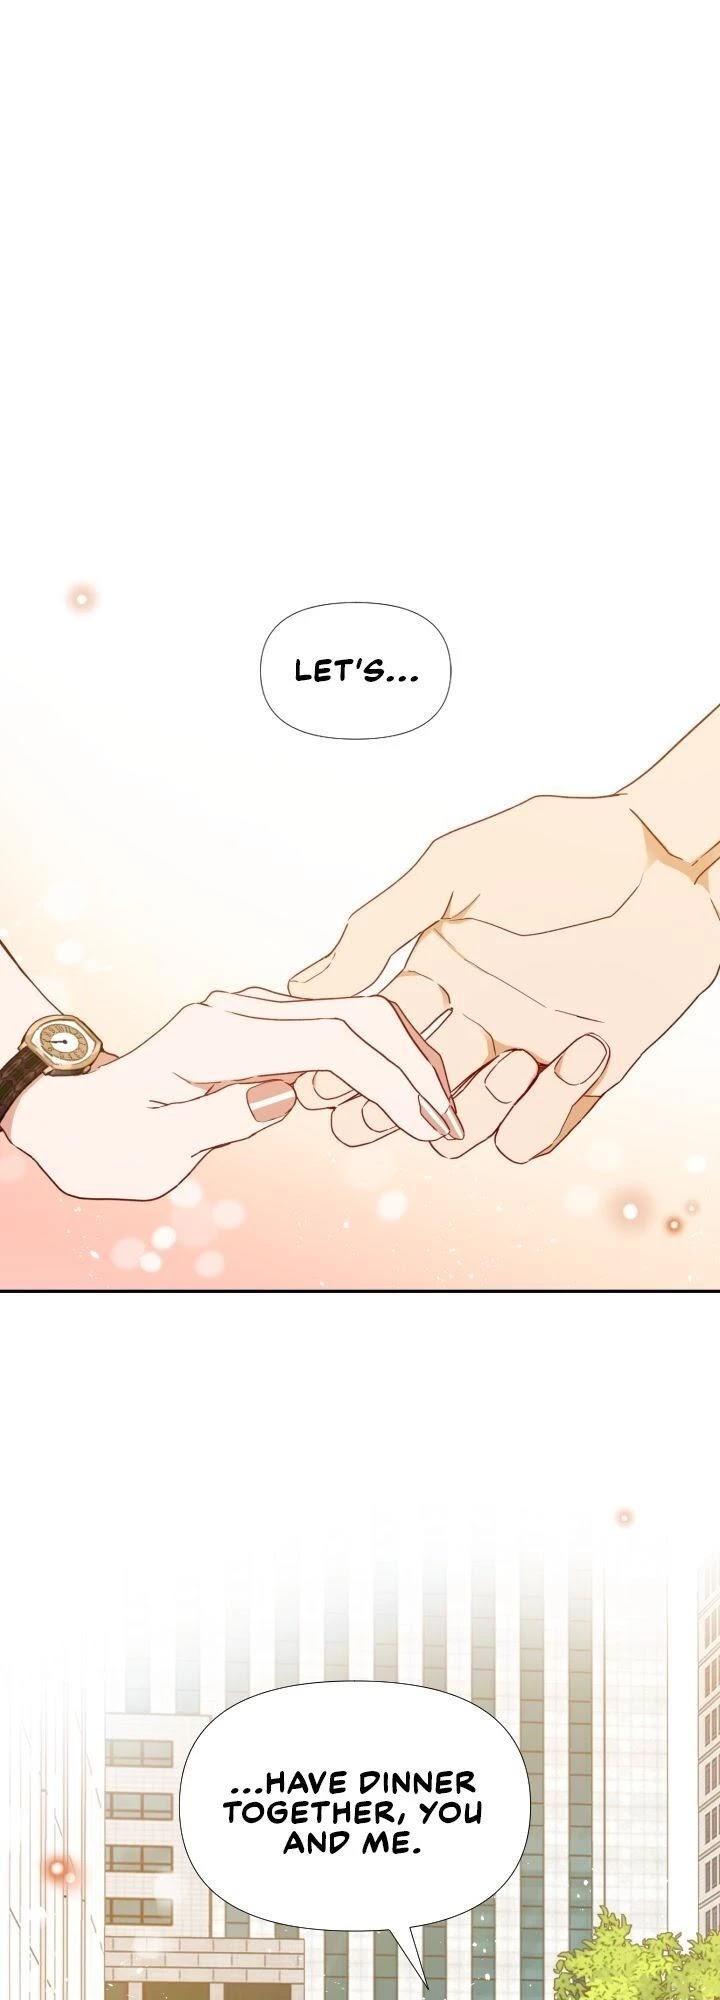 An Hour Of Romance Chapter 60 page 1 - Mangakakalots.com